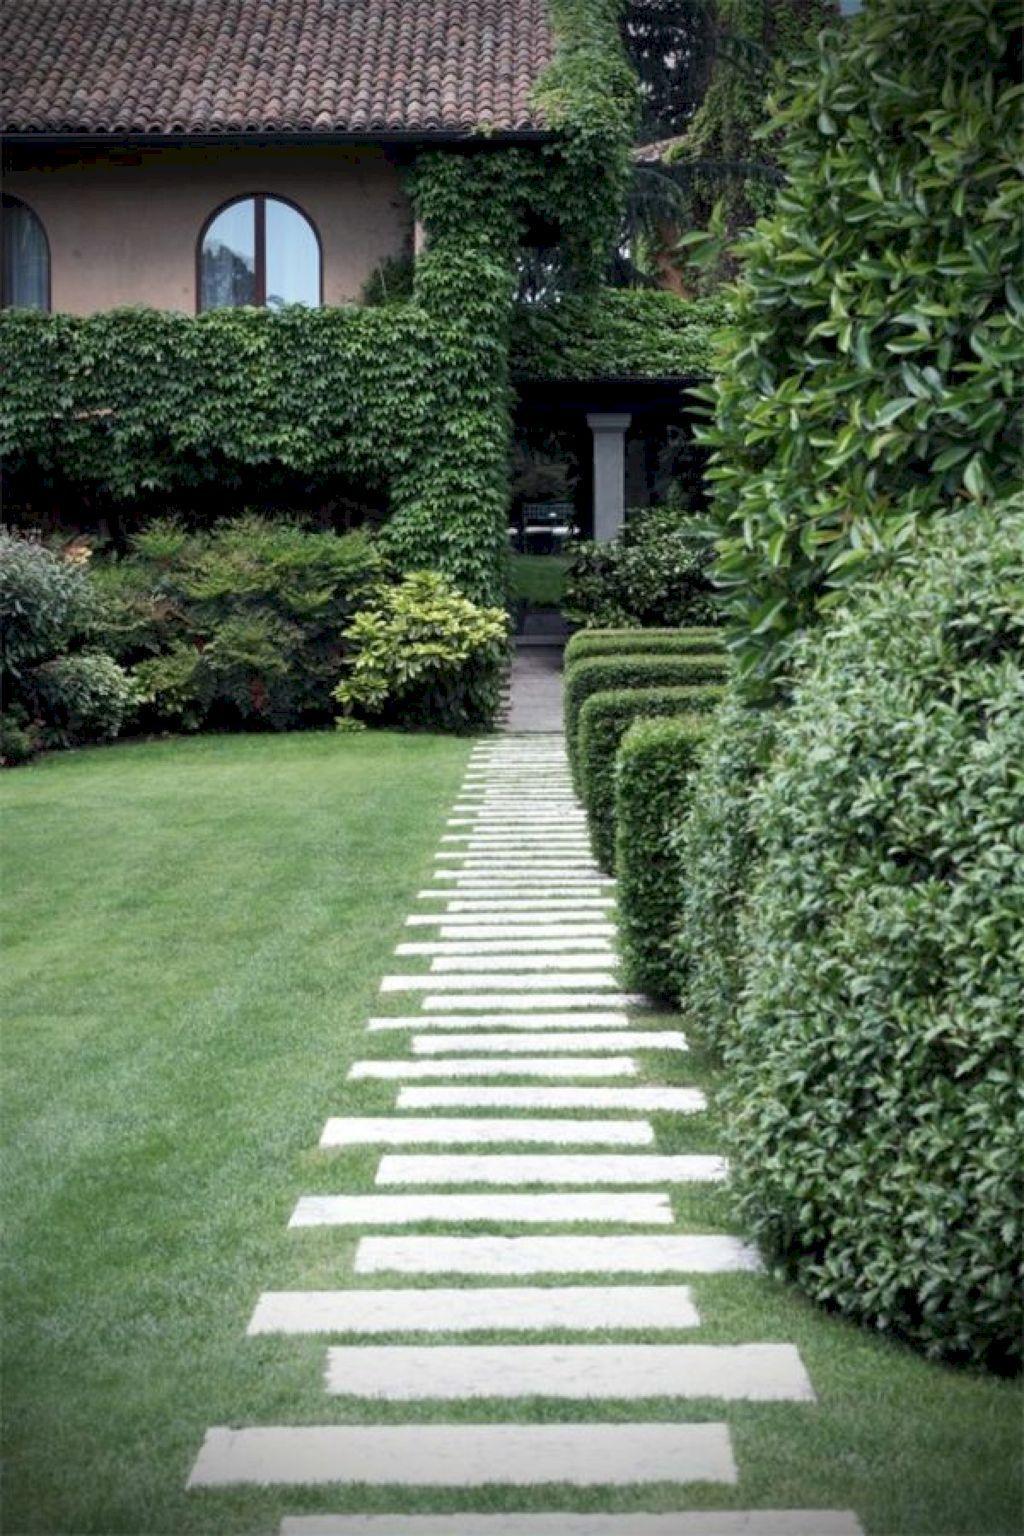 Cool 100 Awesome Garden Pathway Design Ideas ://bellezaroom.com/2018 & Cool 100 Awesome Garden Pathway Design Ideas https://bellezaroom.com ...